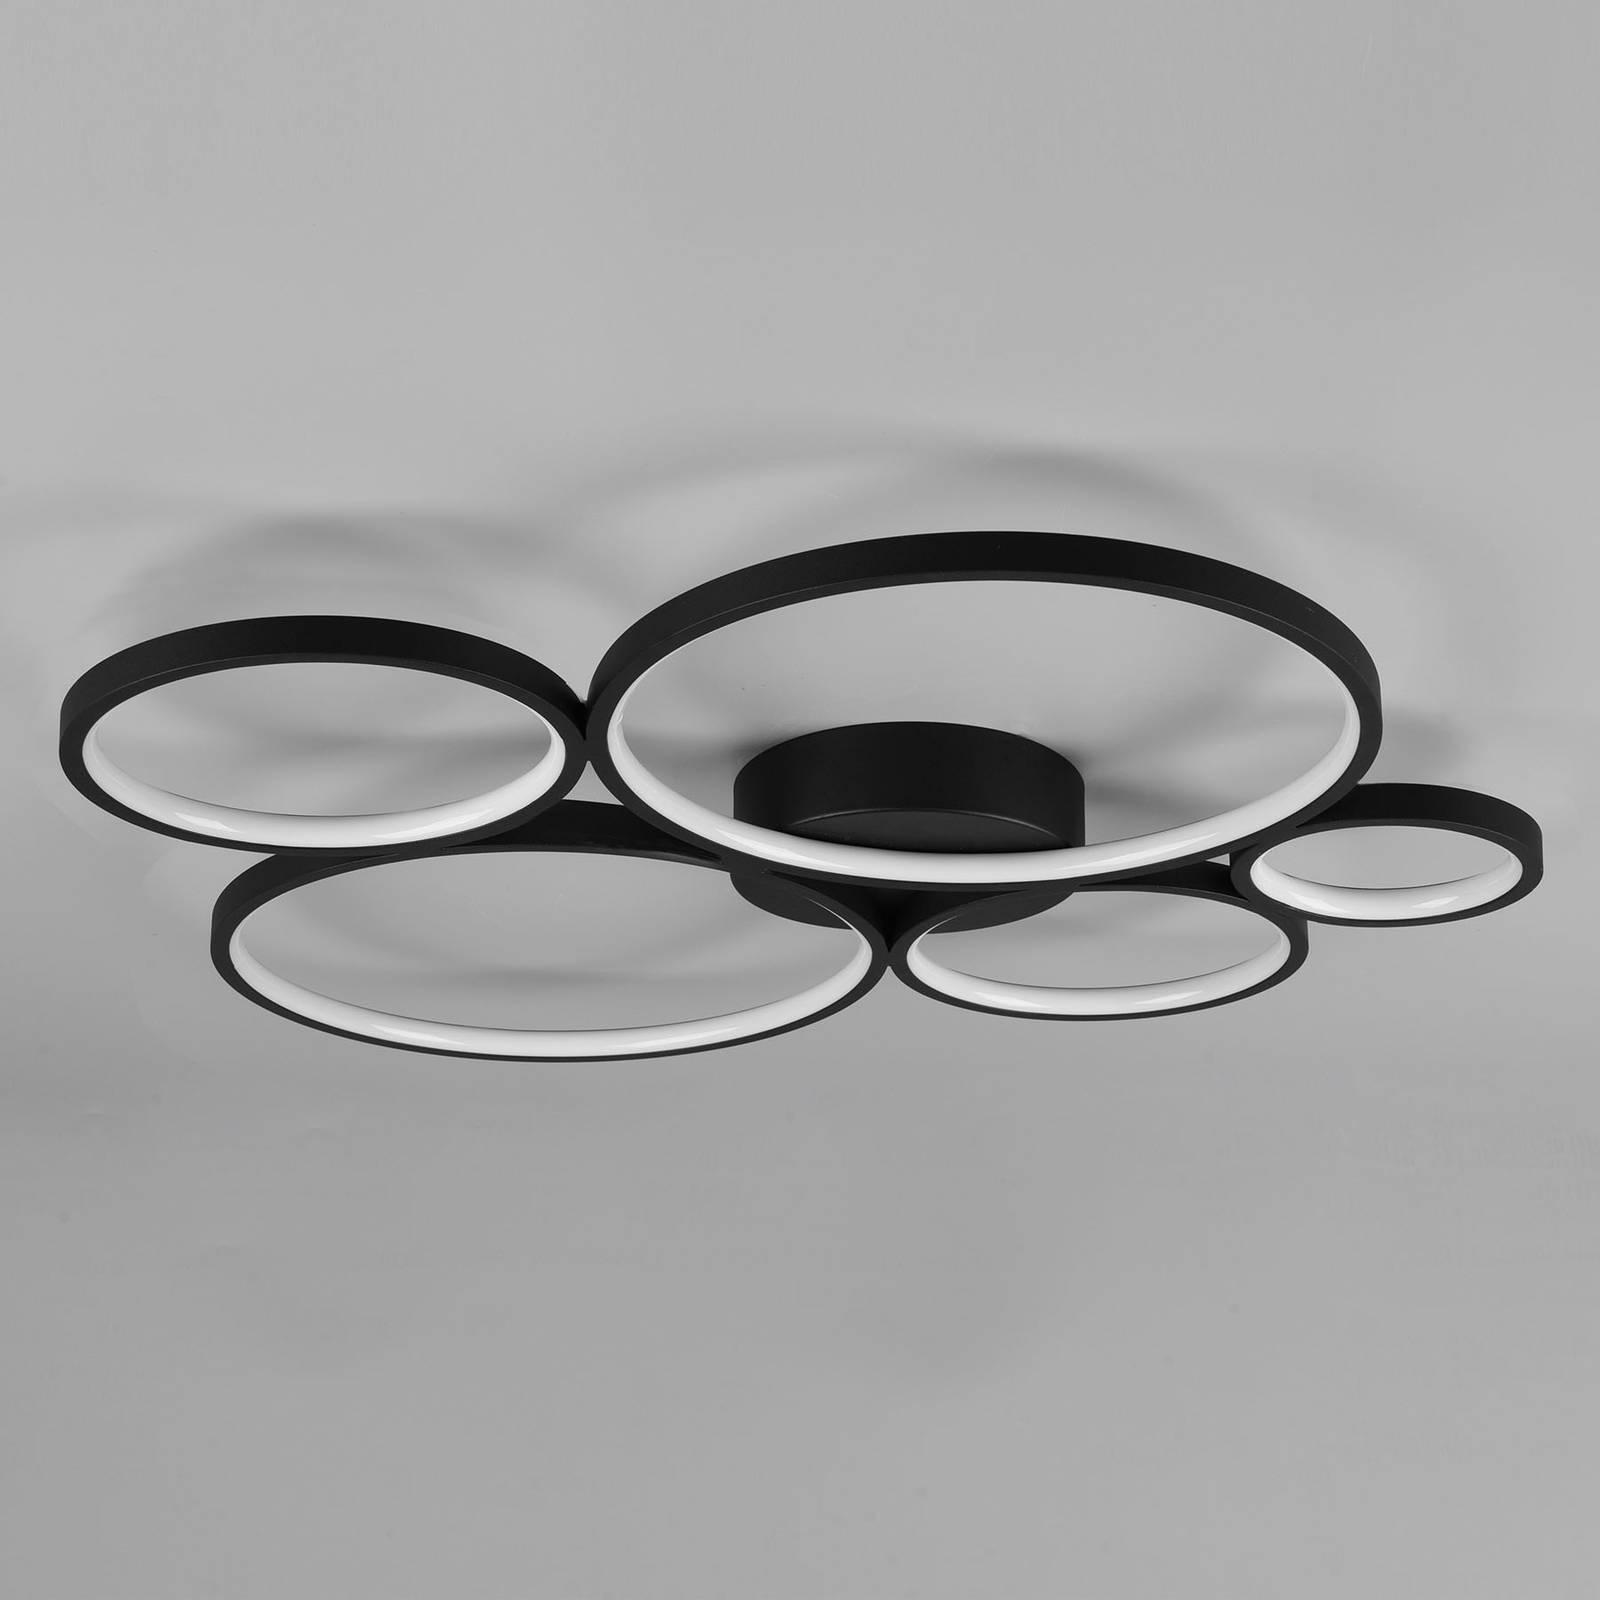 Lampa sufitowa LED Rondo, czarna matowa